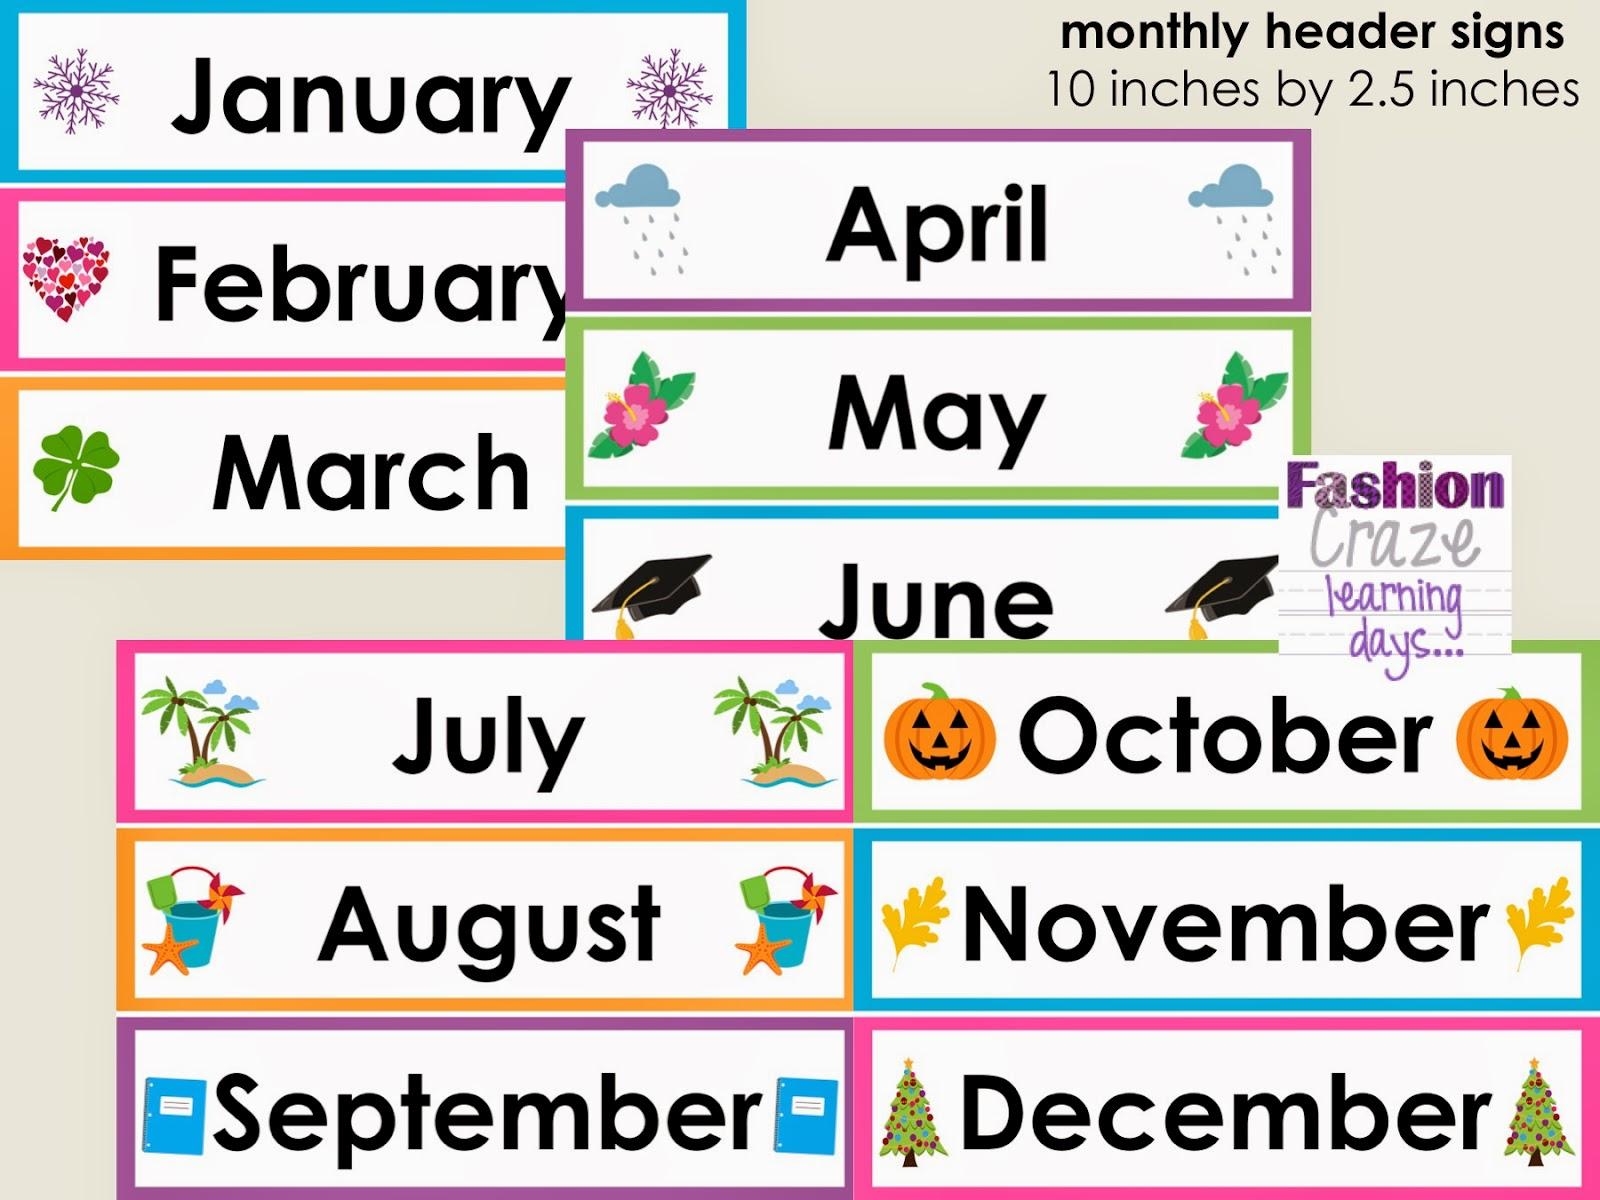 April calendar headings clipart vector freeuse stock April calendar headings clipart - ClipartFest vector freeuse stock